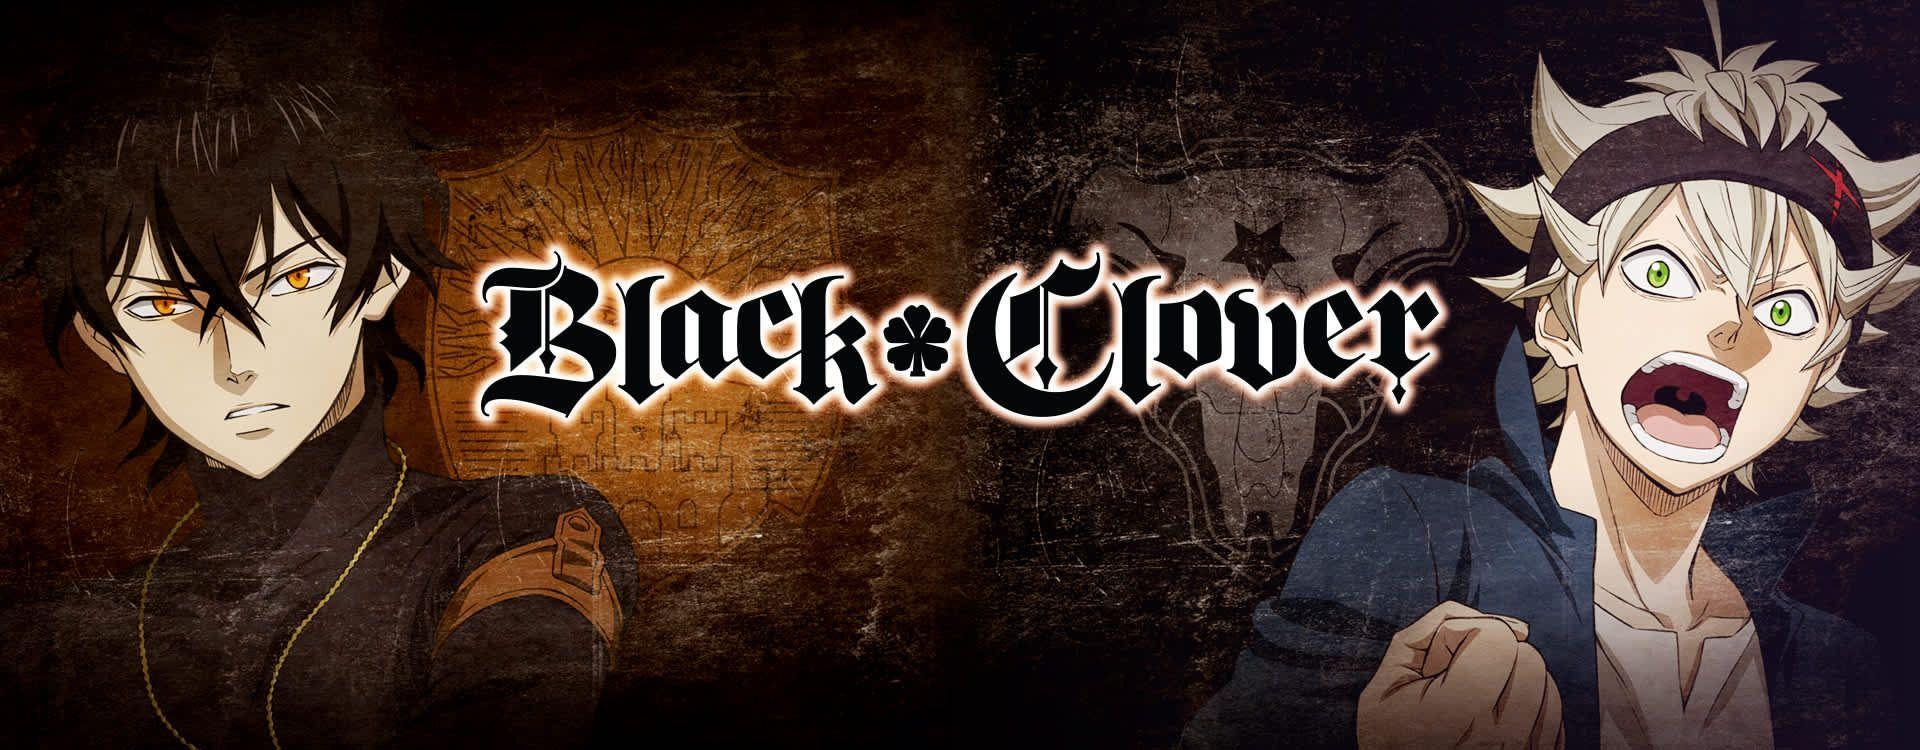 Black Clover 4K Wallpapers - Top Free Black Clover 4K ...